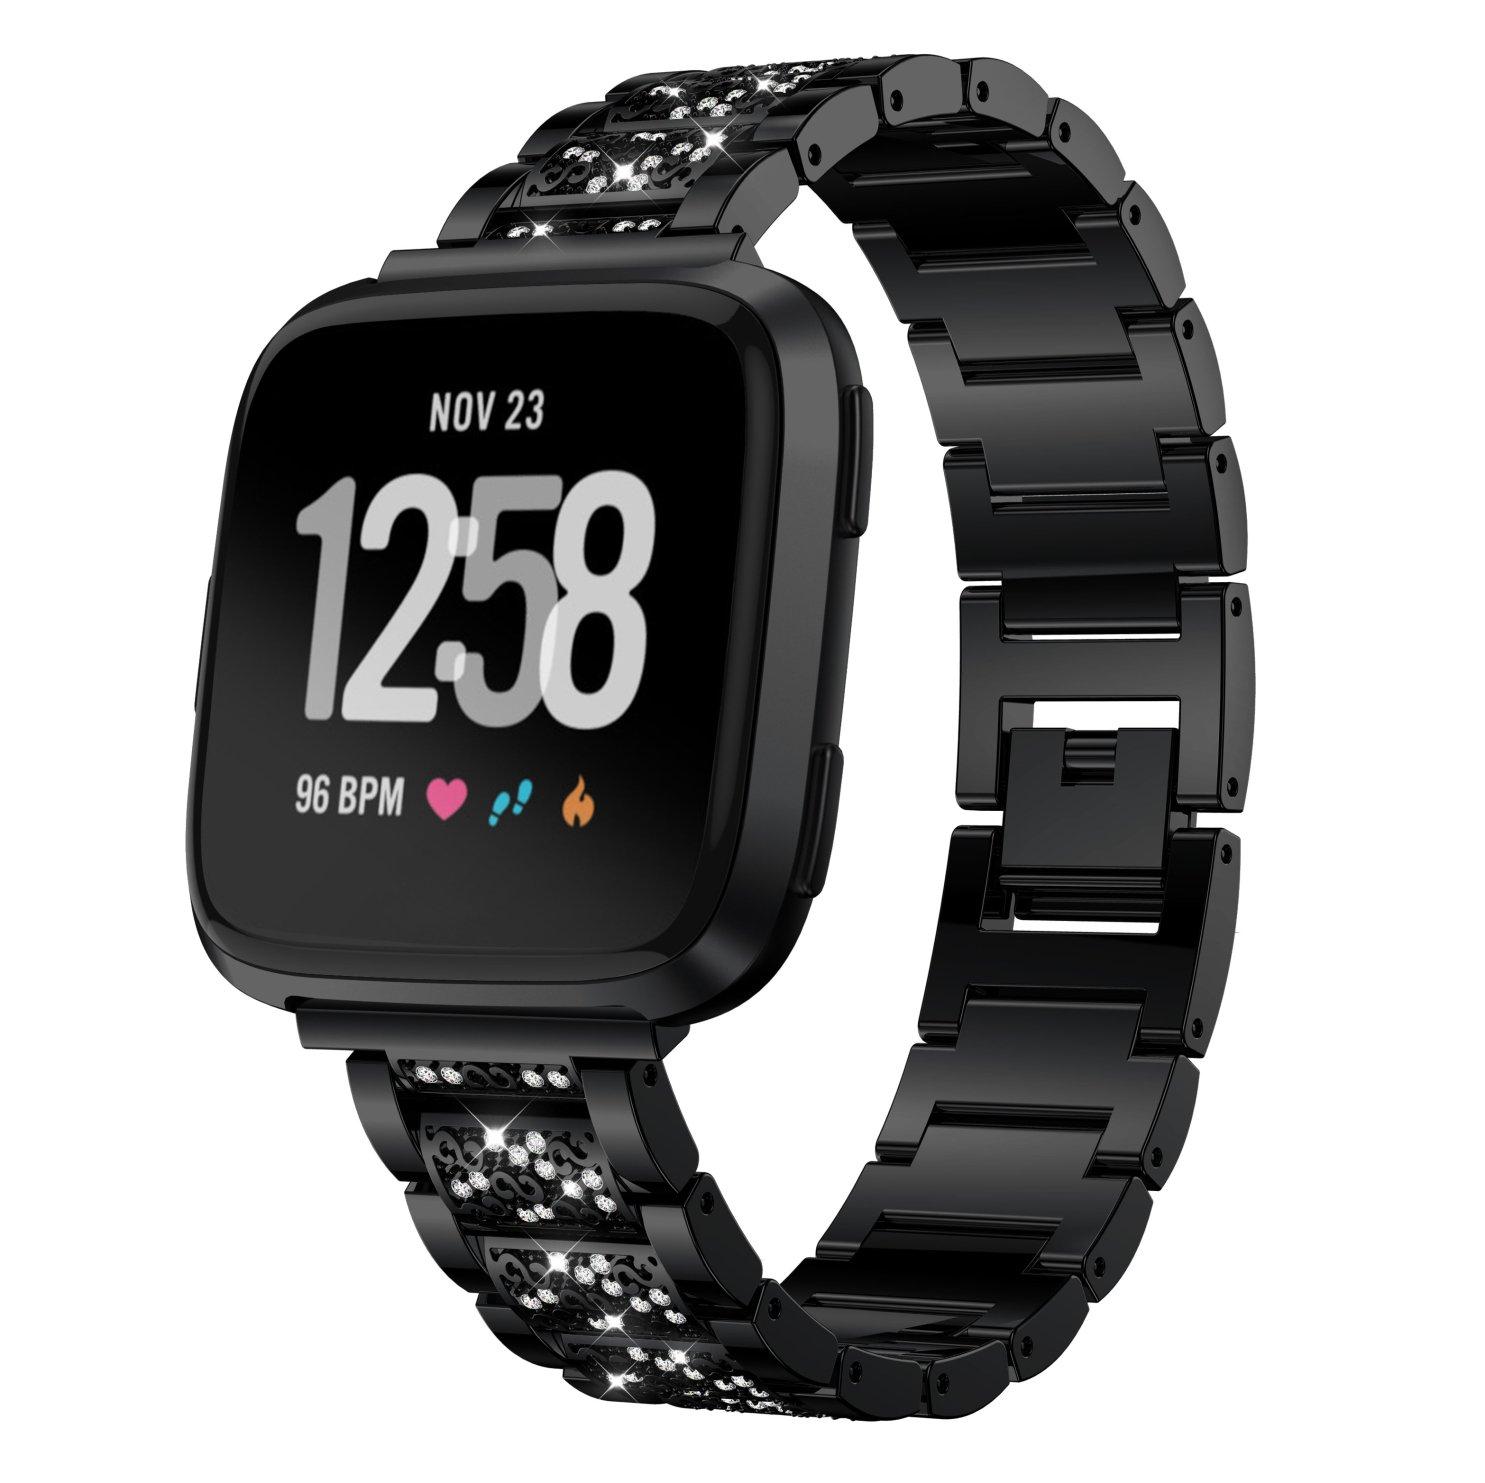 verstellbarer Ersatz Luxus Kristall Edelstahl Band Metall Uhrenband Armband f/ür Fitbit Versa Smartwatch YuStar f/ür Fitbit Versa Band